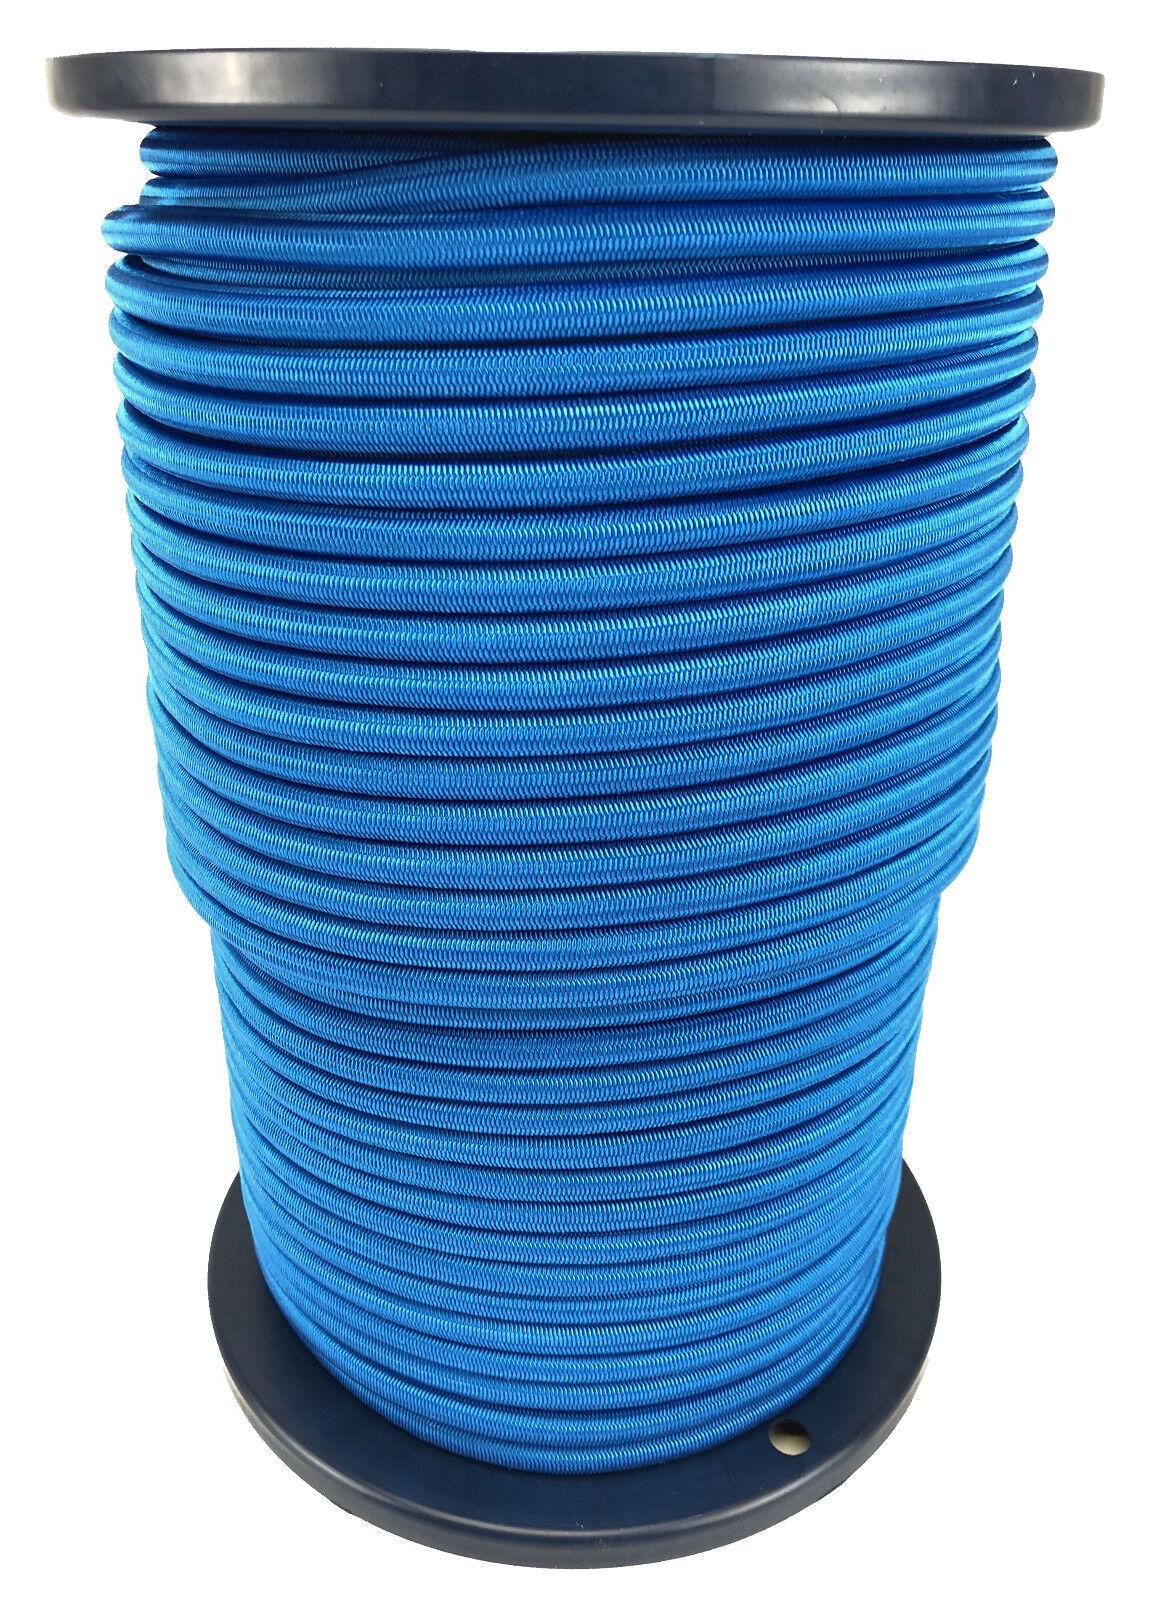 Azul real Cuerda Elástica Cuerda Cuerda Elástica anudable 4mm 6mm 8mm 10mm 12mm